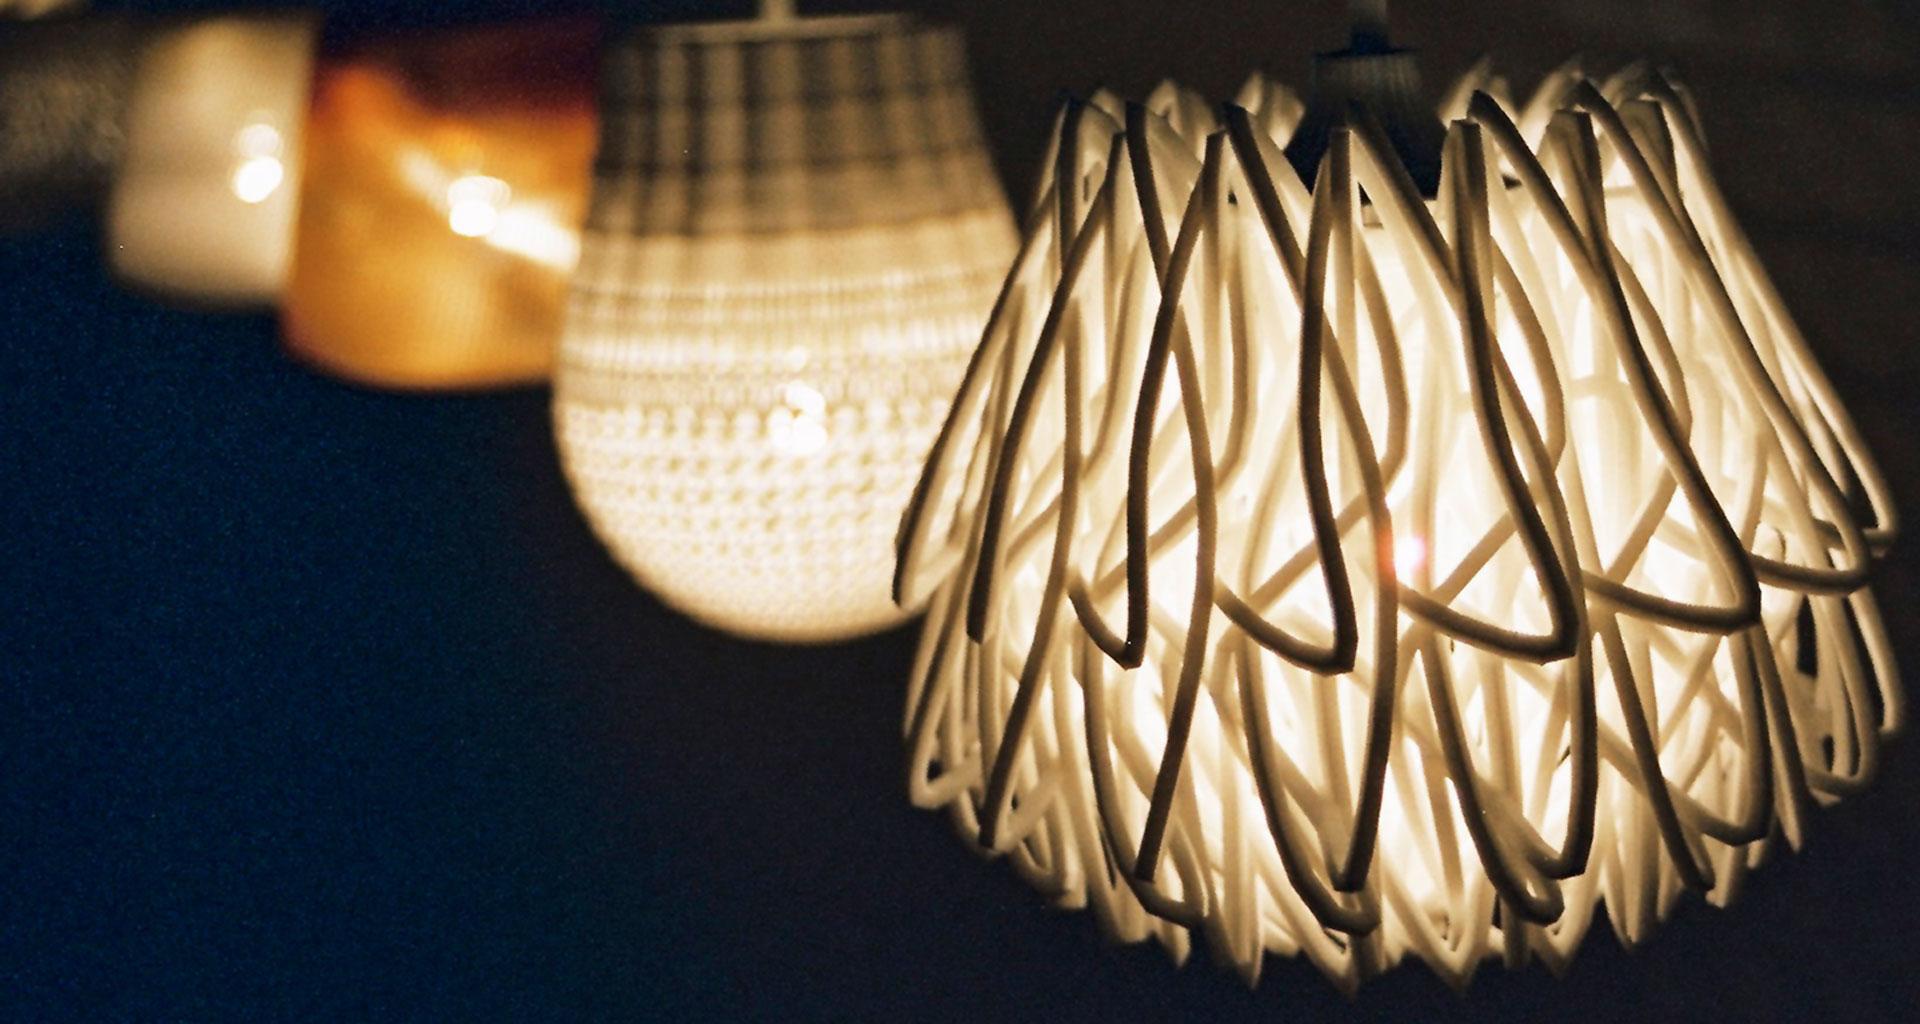 Lampen2_b